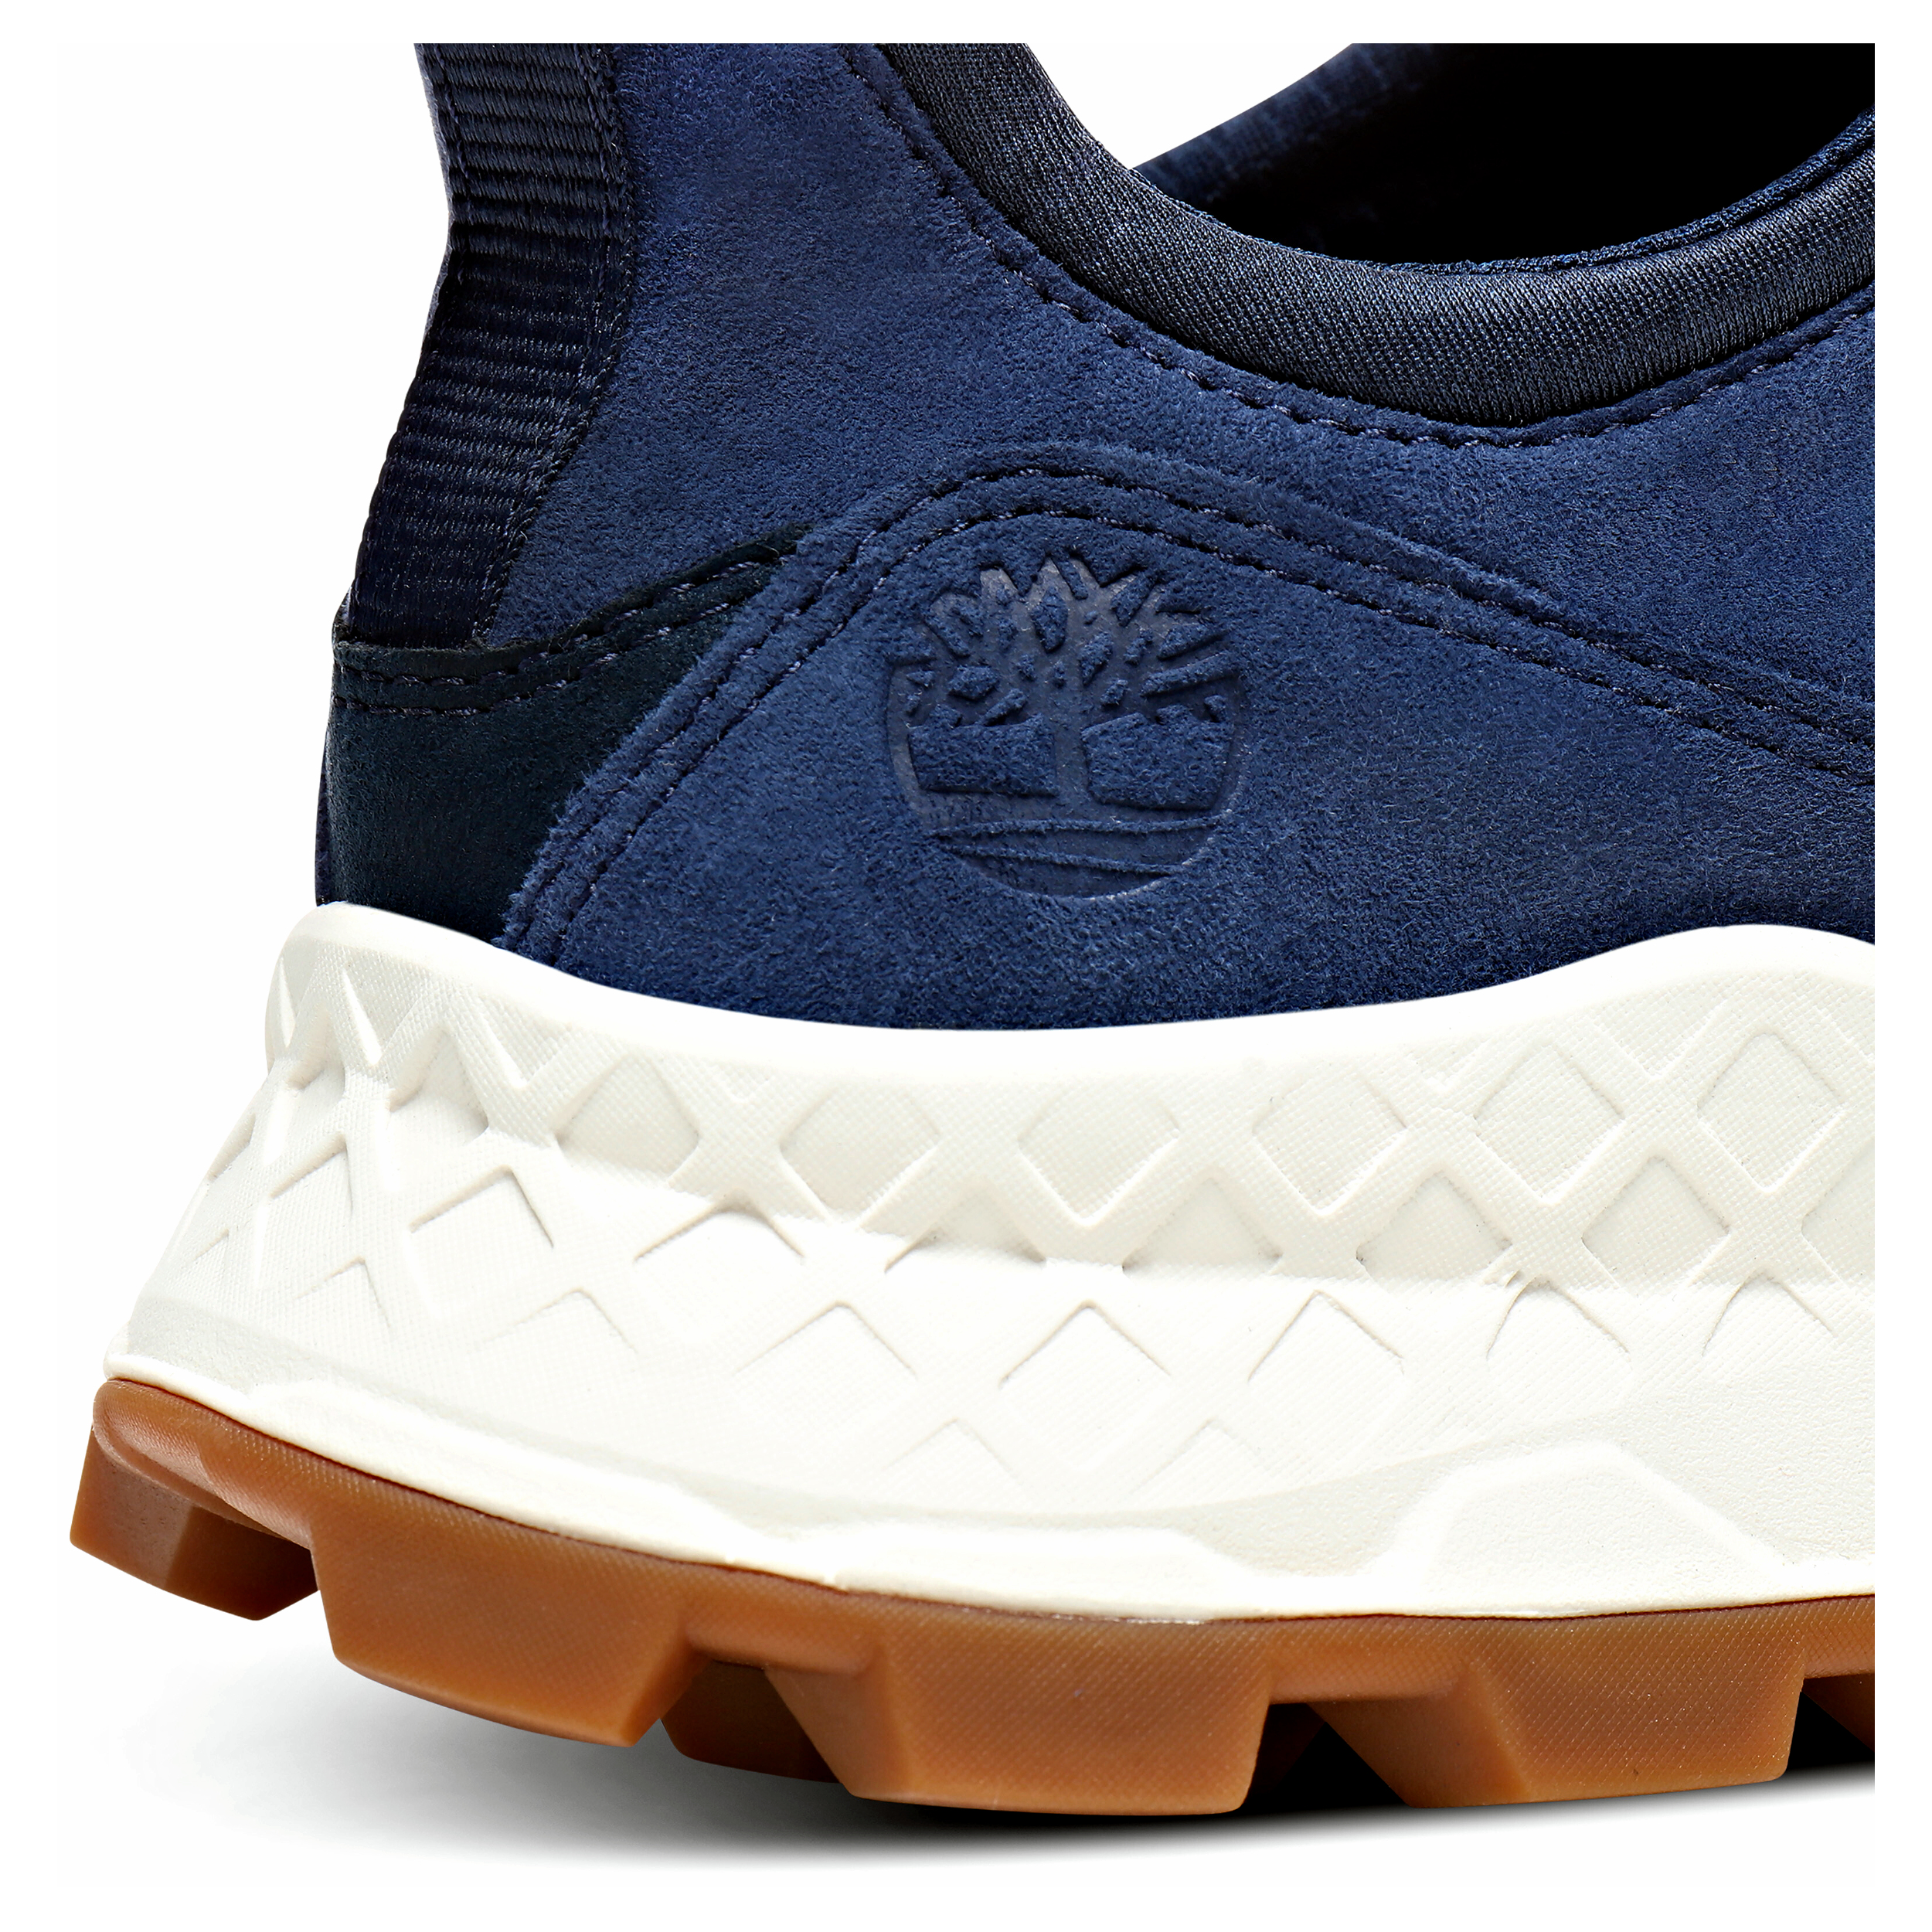 کفش راحتی مردانه تیمبرلند مدل Brooklyn Lace Oxford کد a1yvp